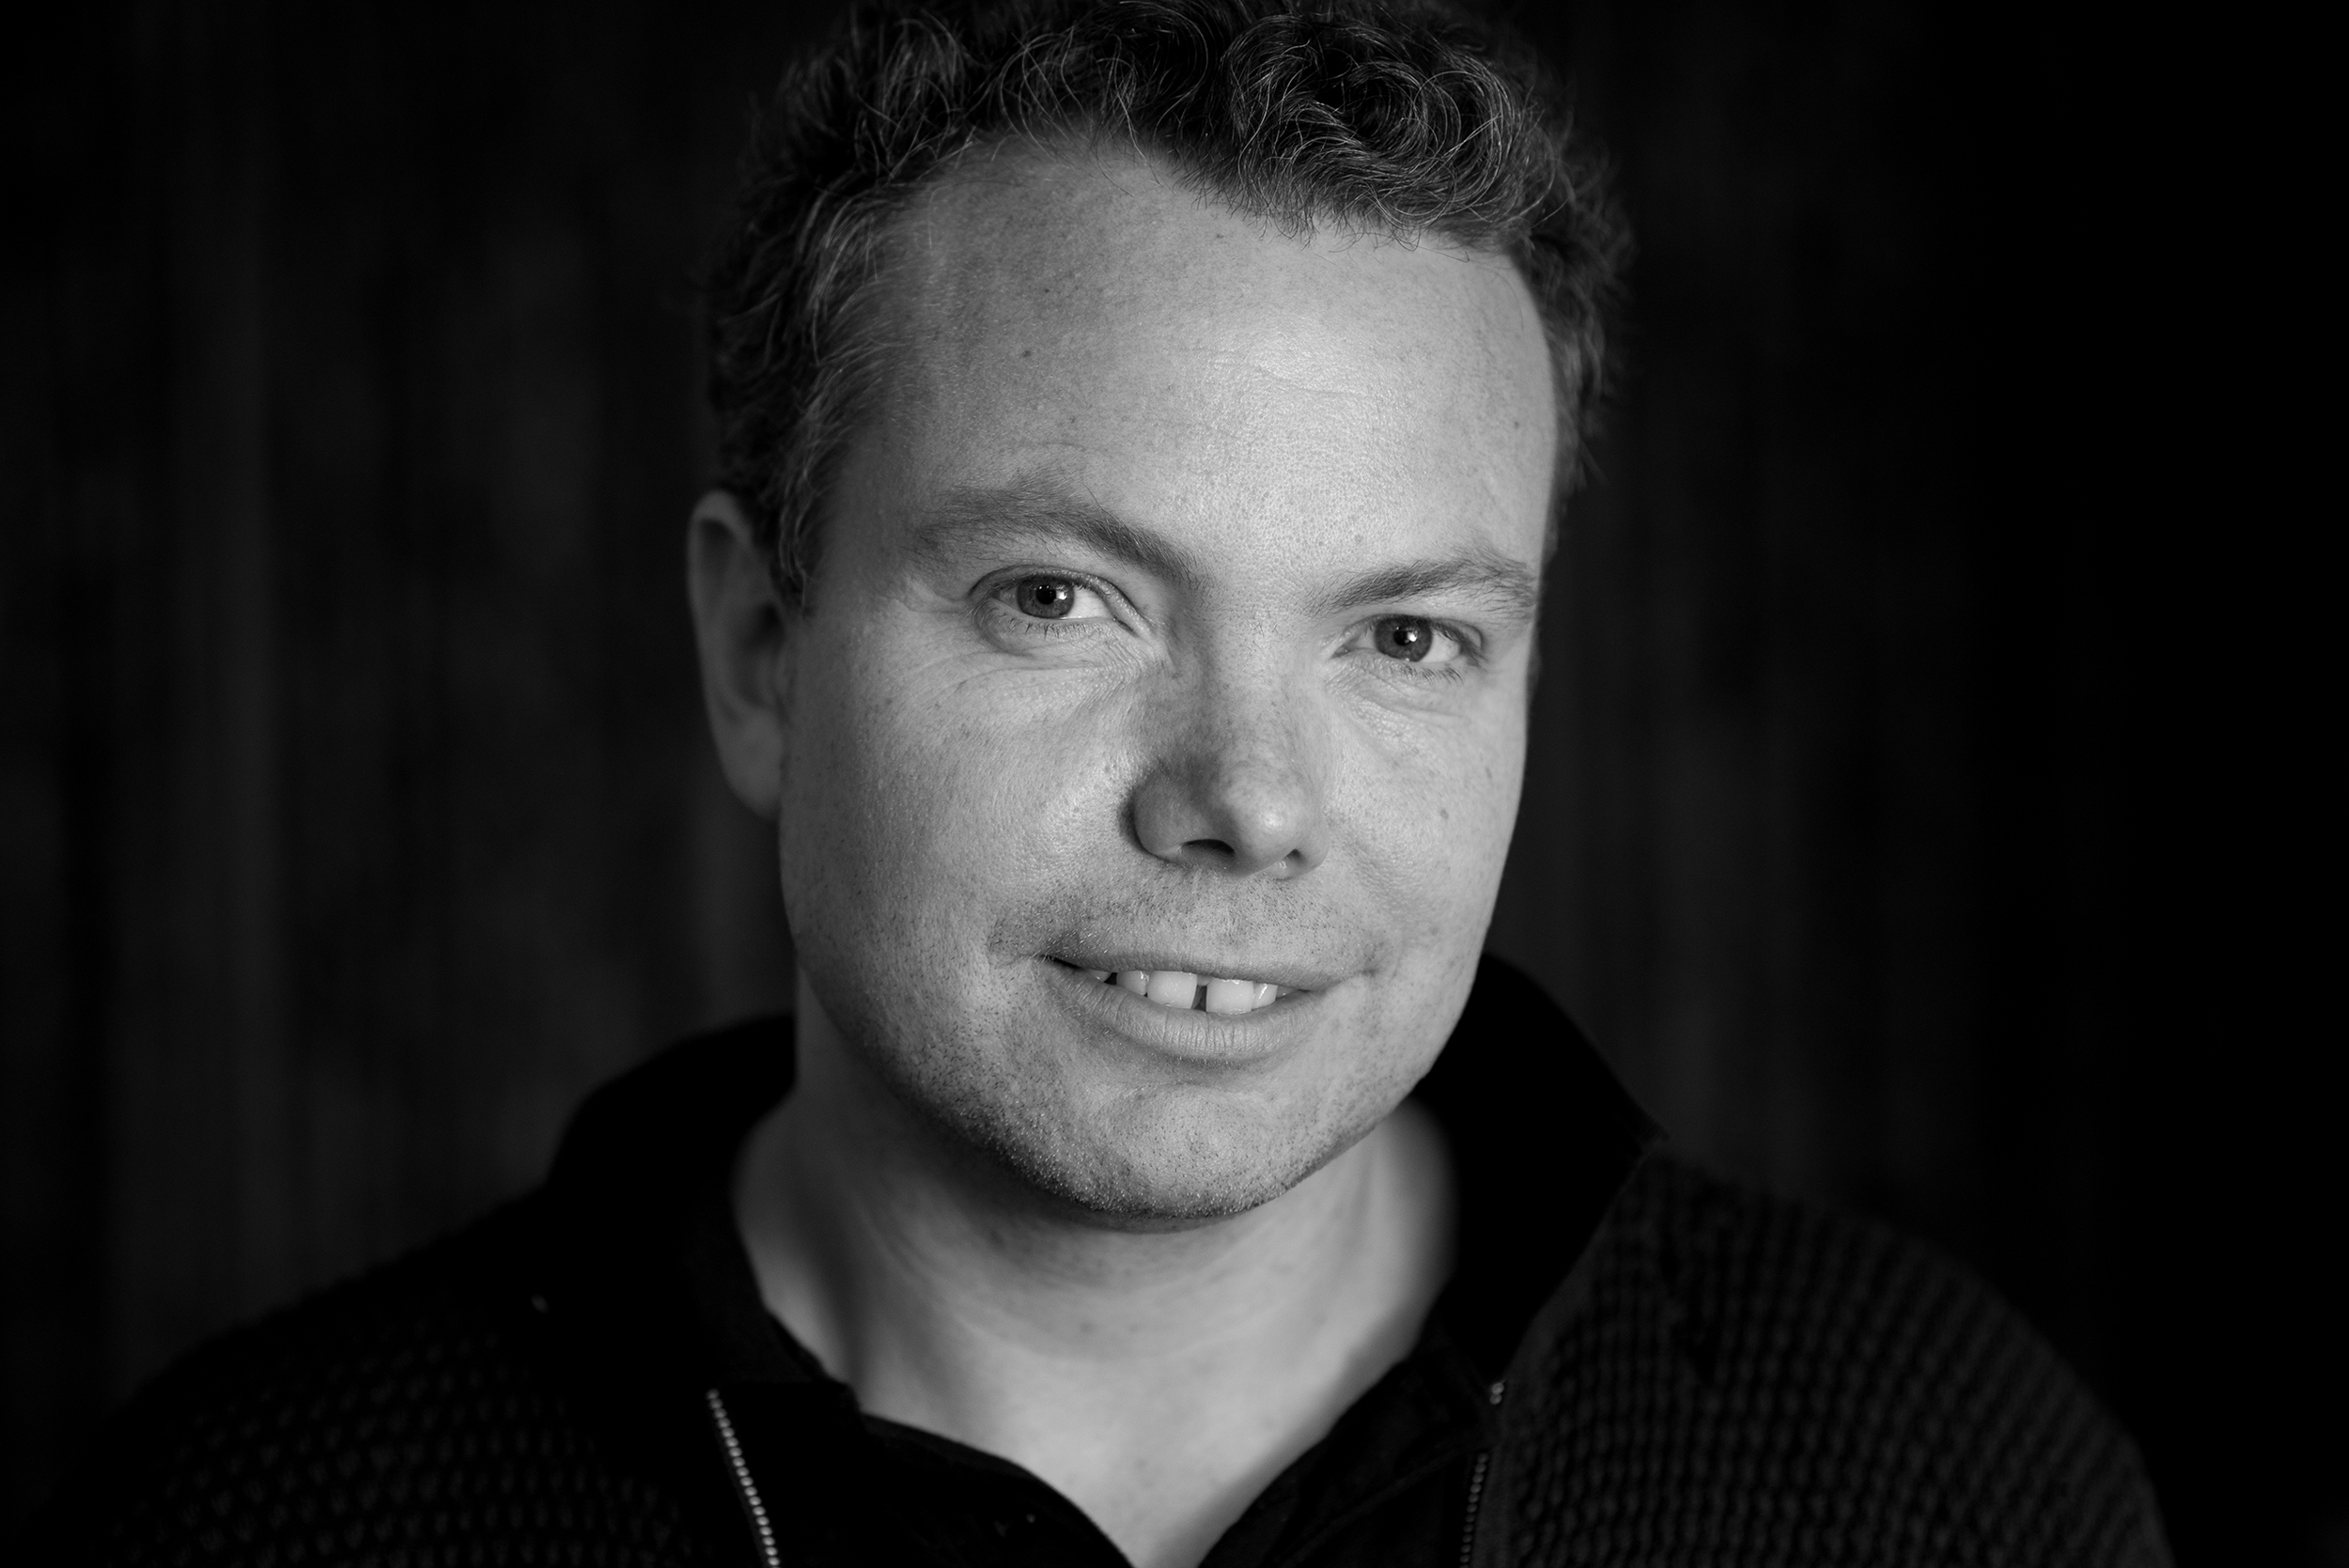 Rasmus Nøhr dogme web.jpg